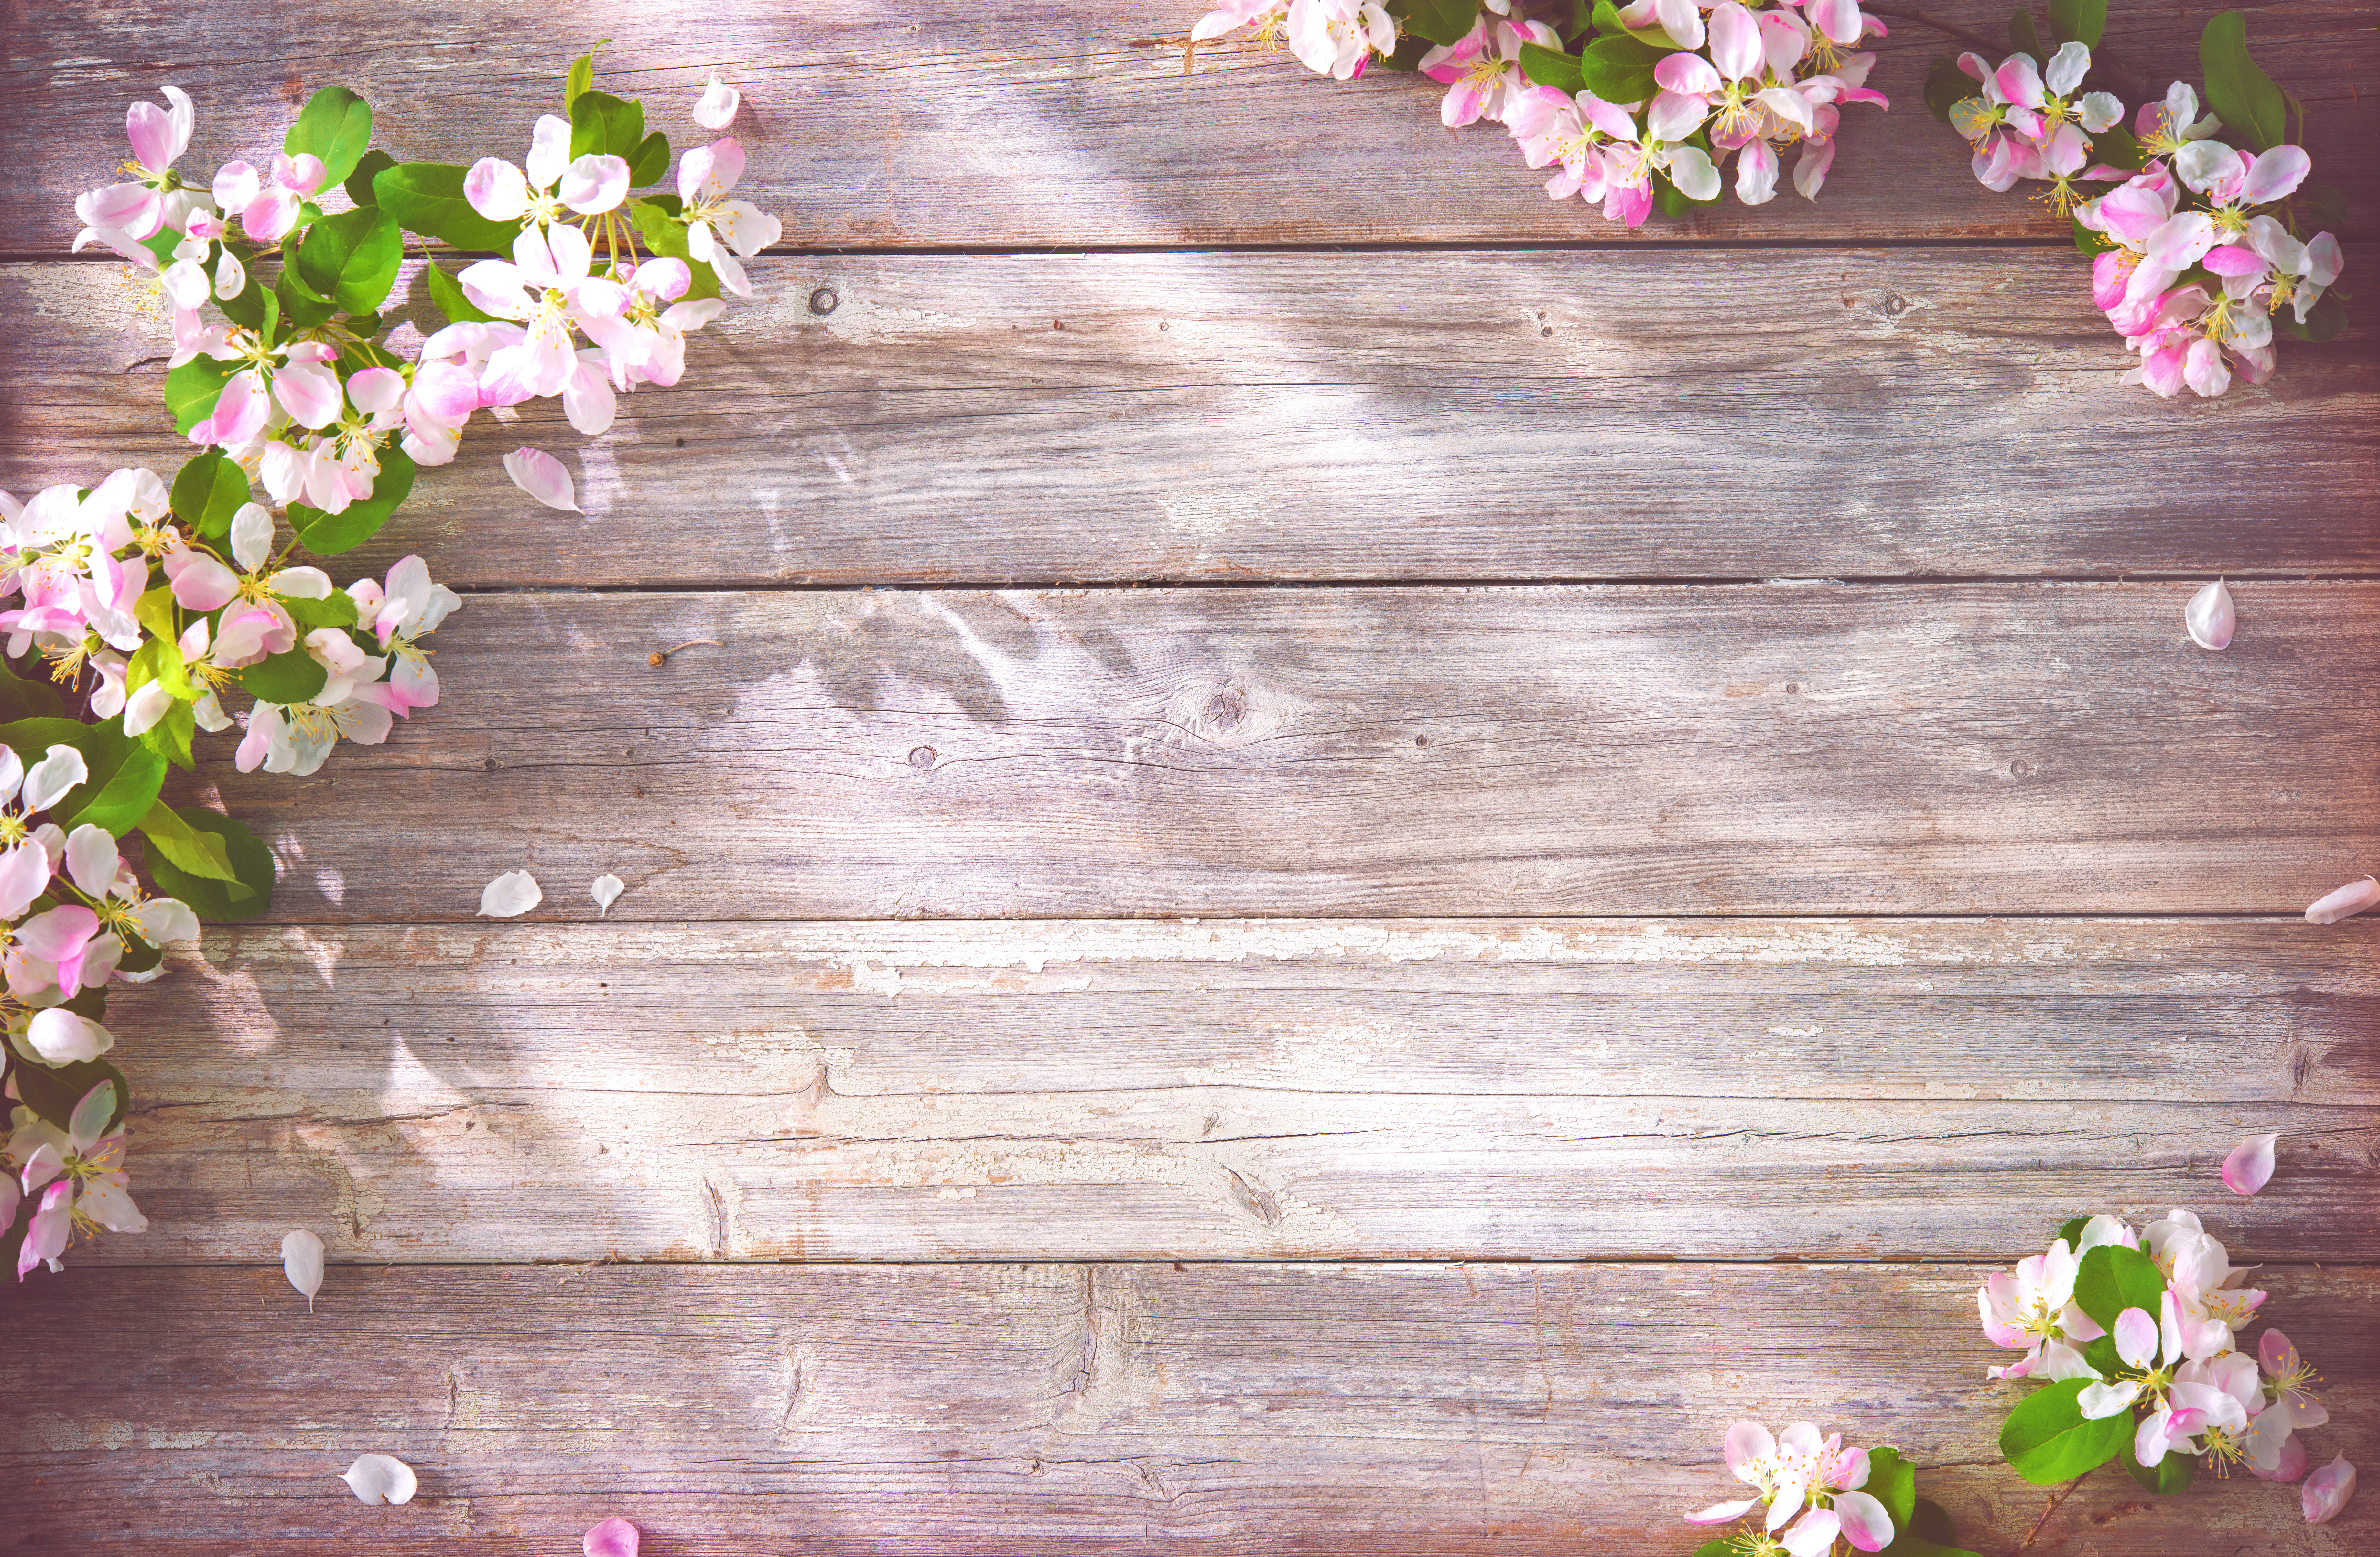 spring apple